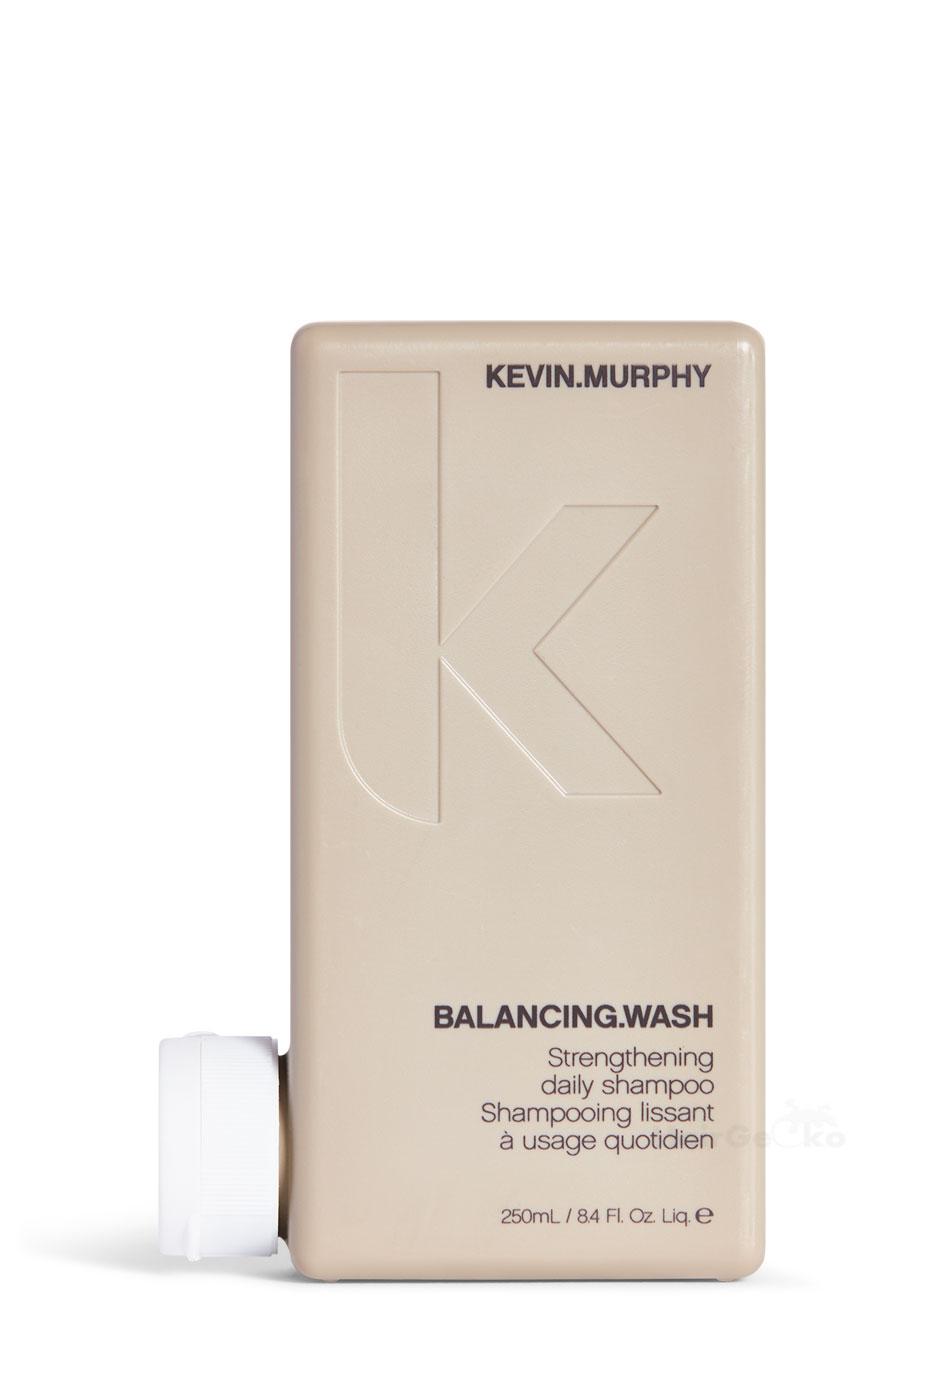 KEVIN.MURPHY BALANCING.WASH 250 ml